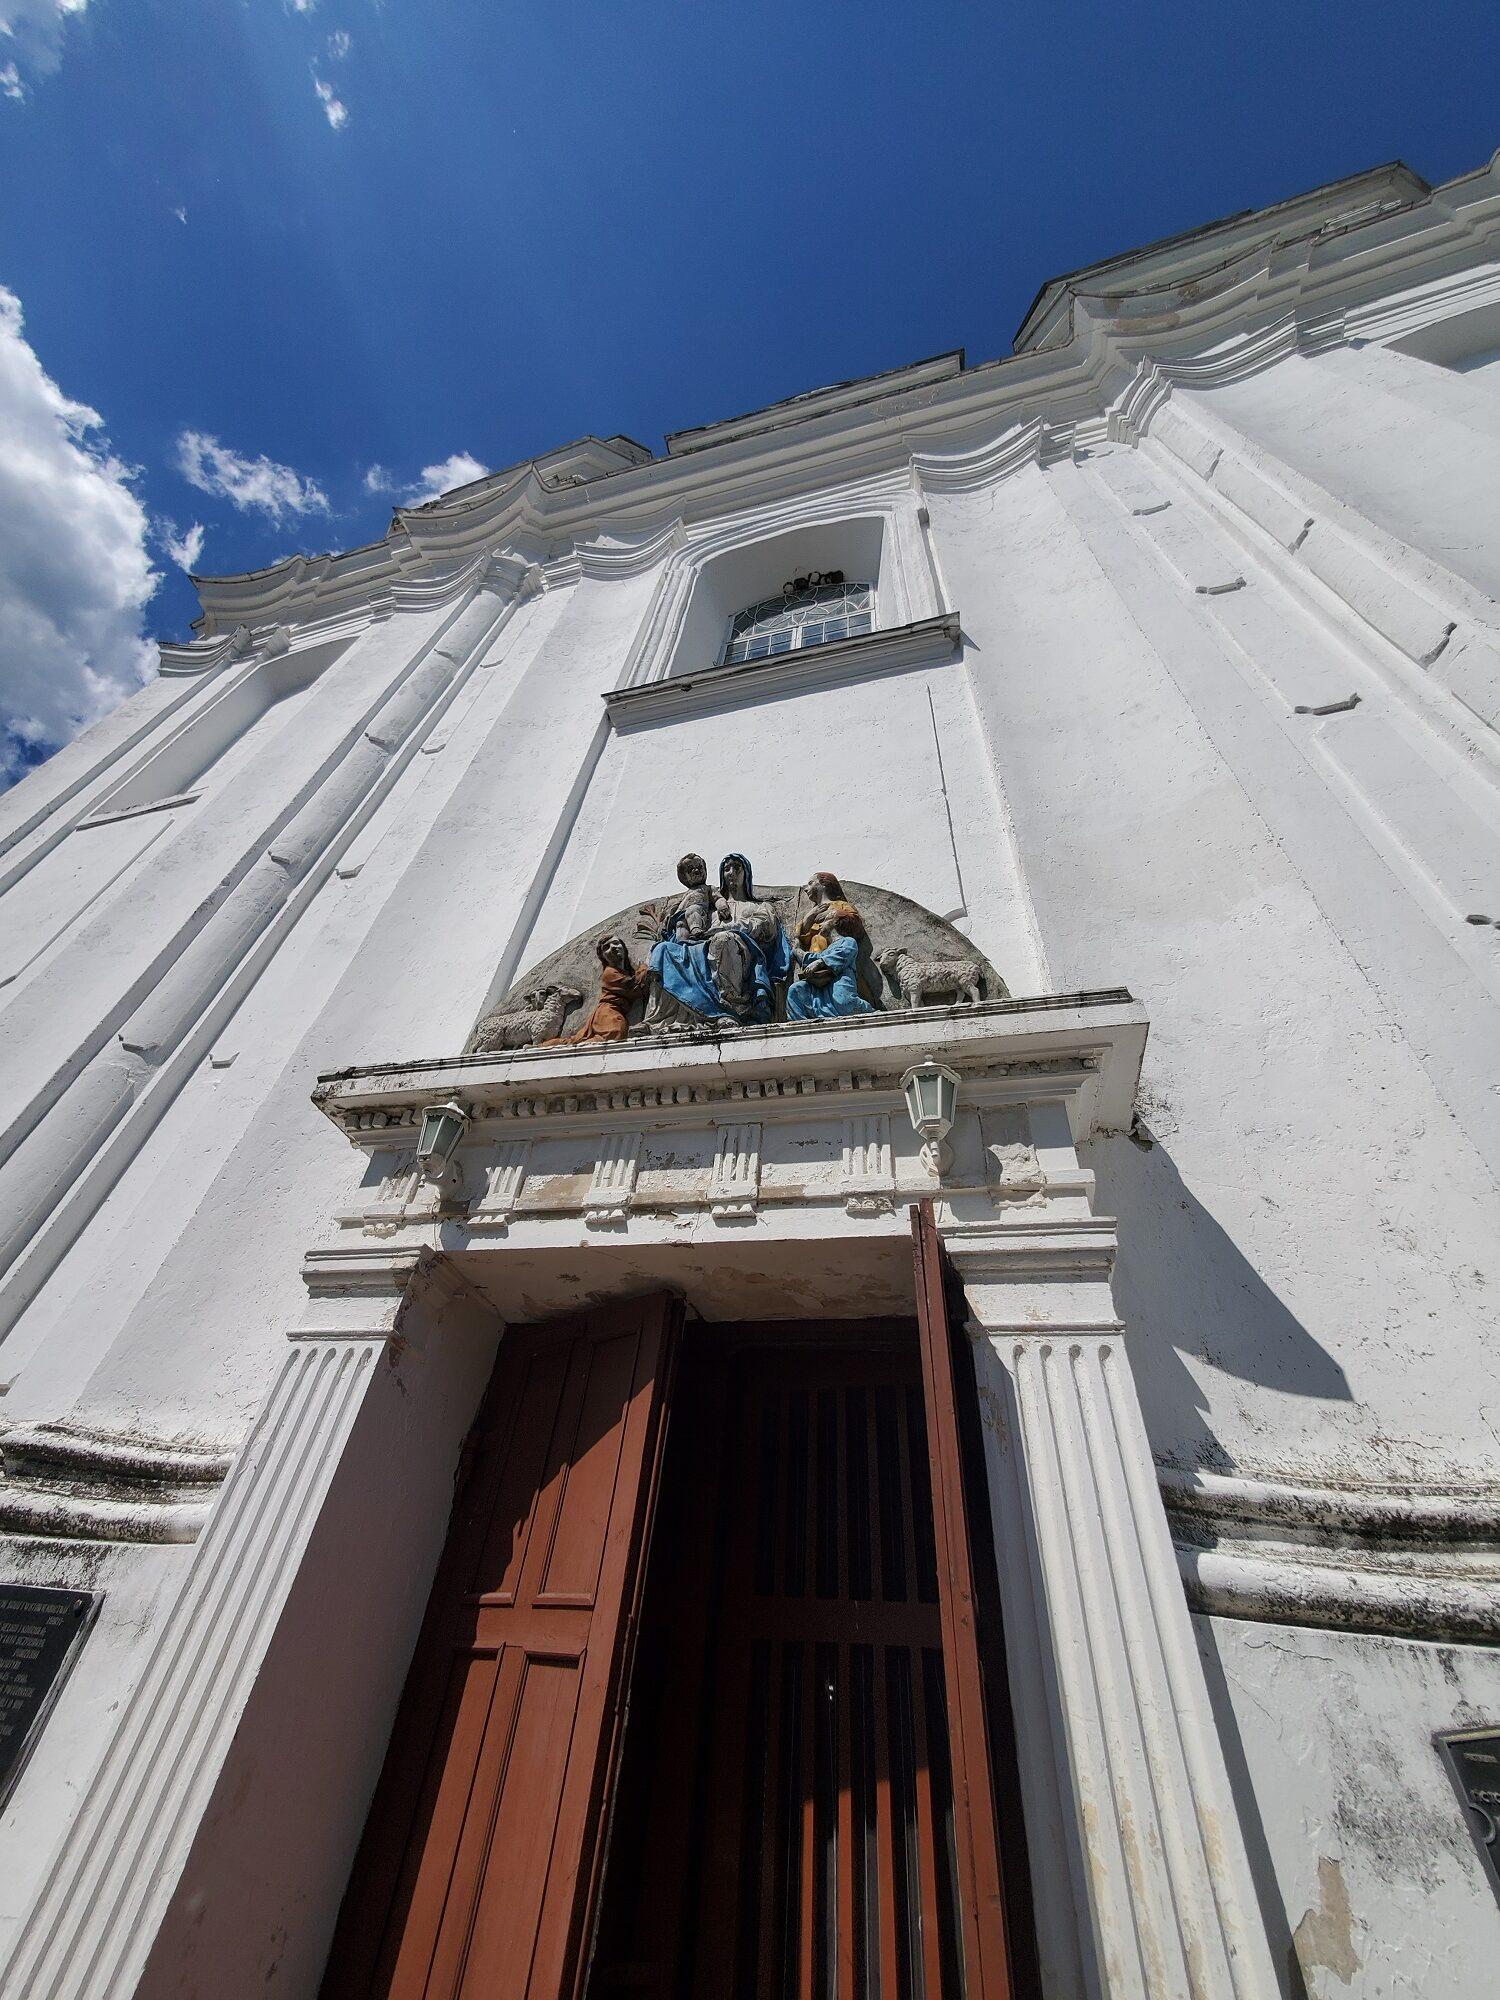 20200606 150853 rotated - Костел Святой Троицы в деревне Дуниловичи